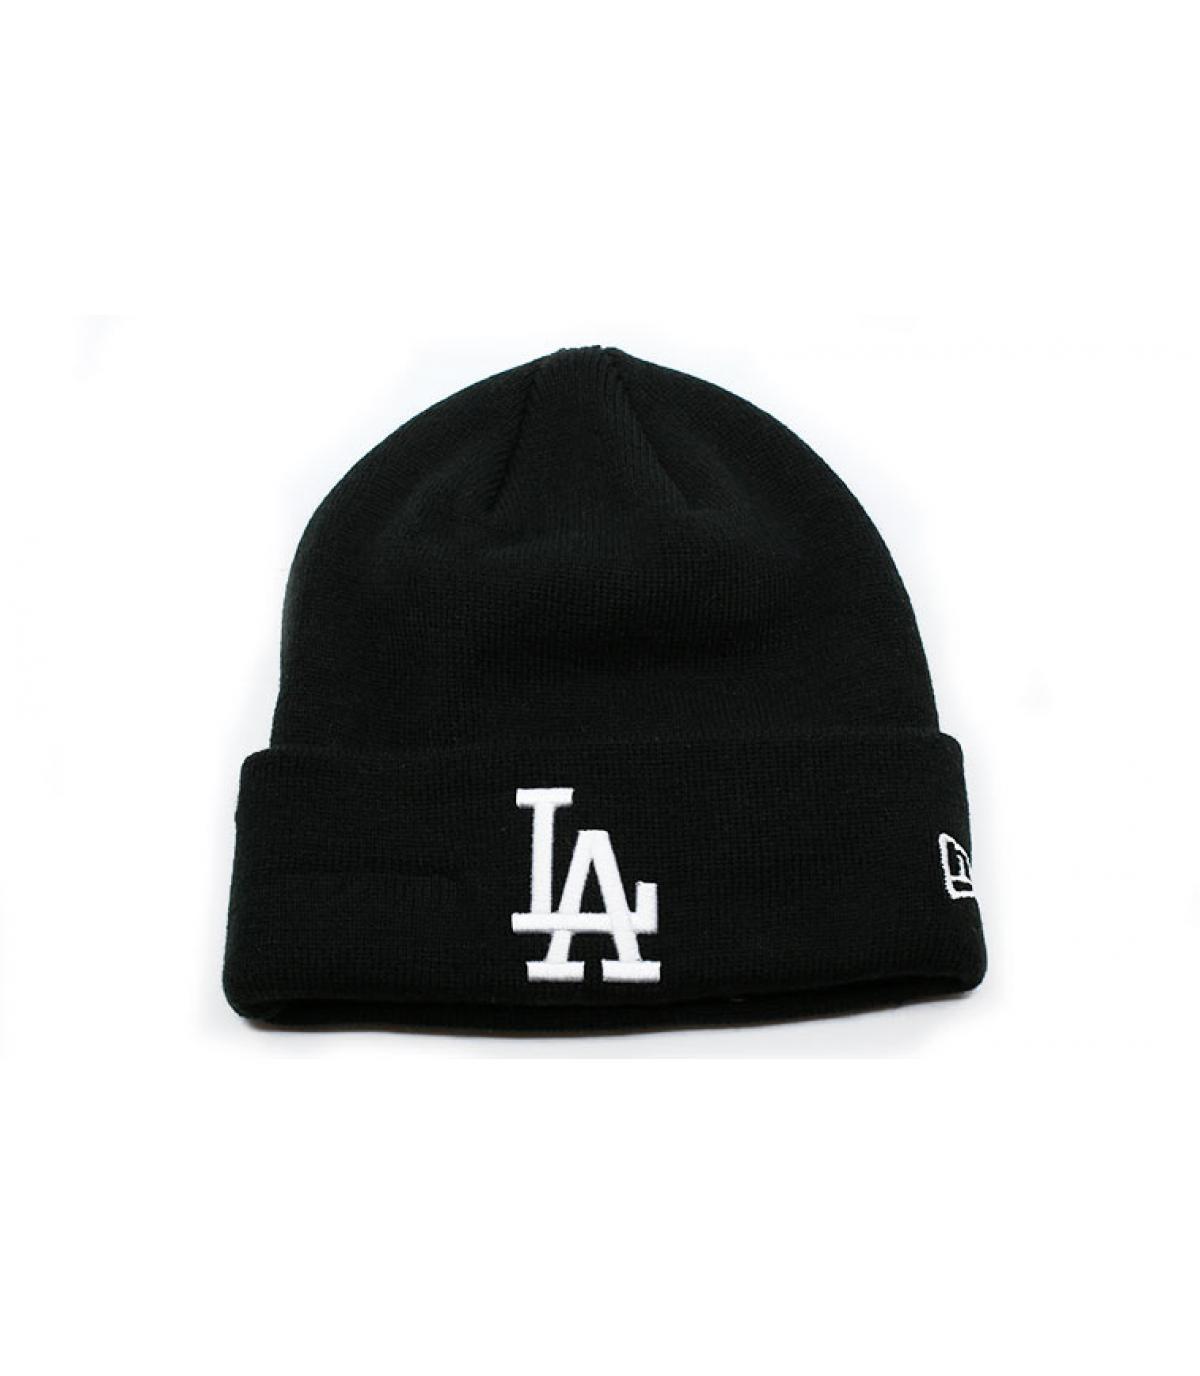 Details MLB Essential Cuff LA black white - afbeeling 2